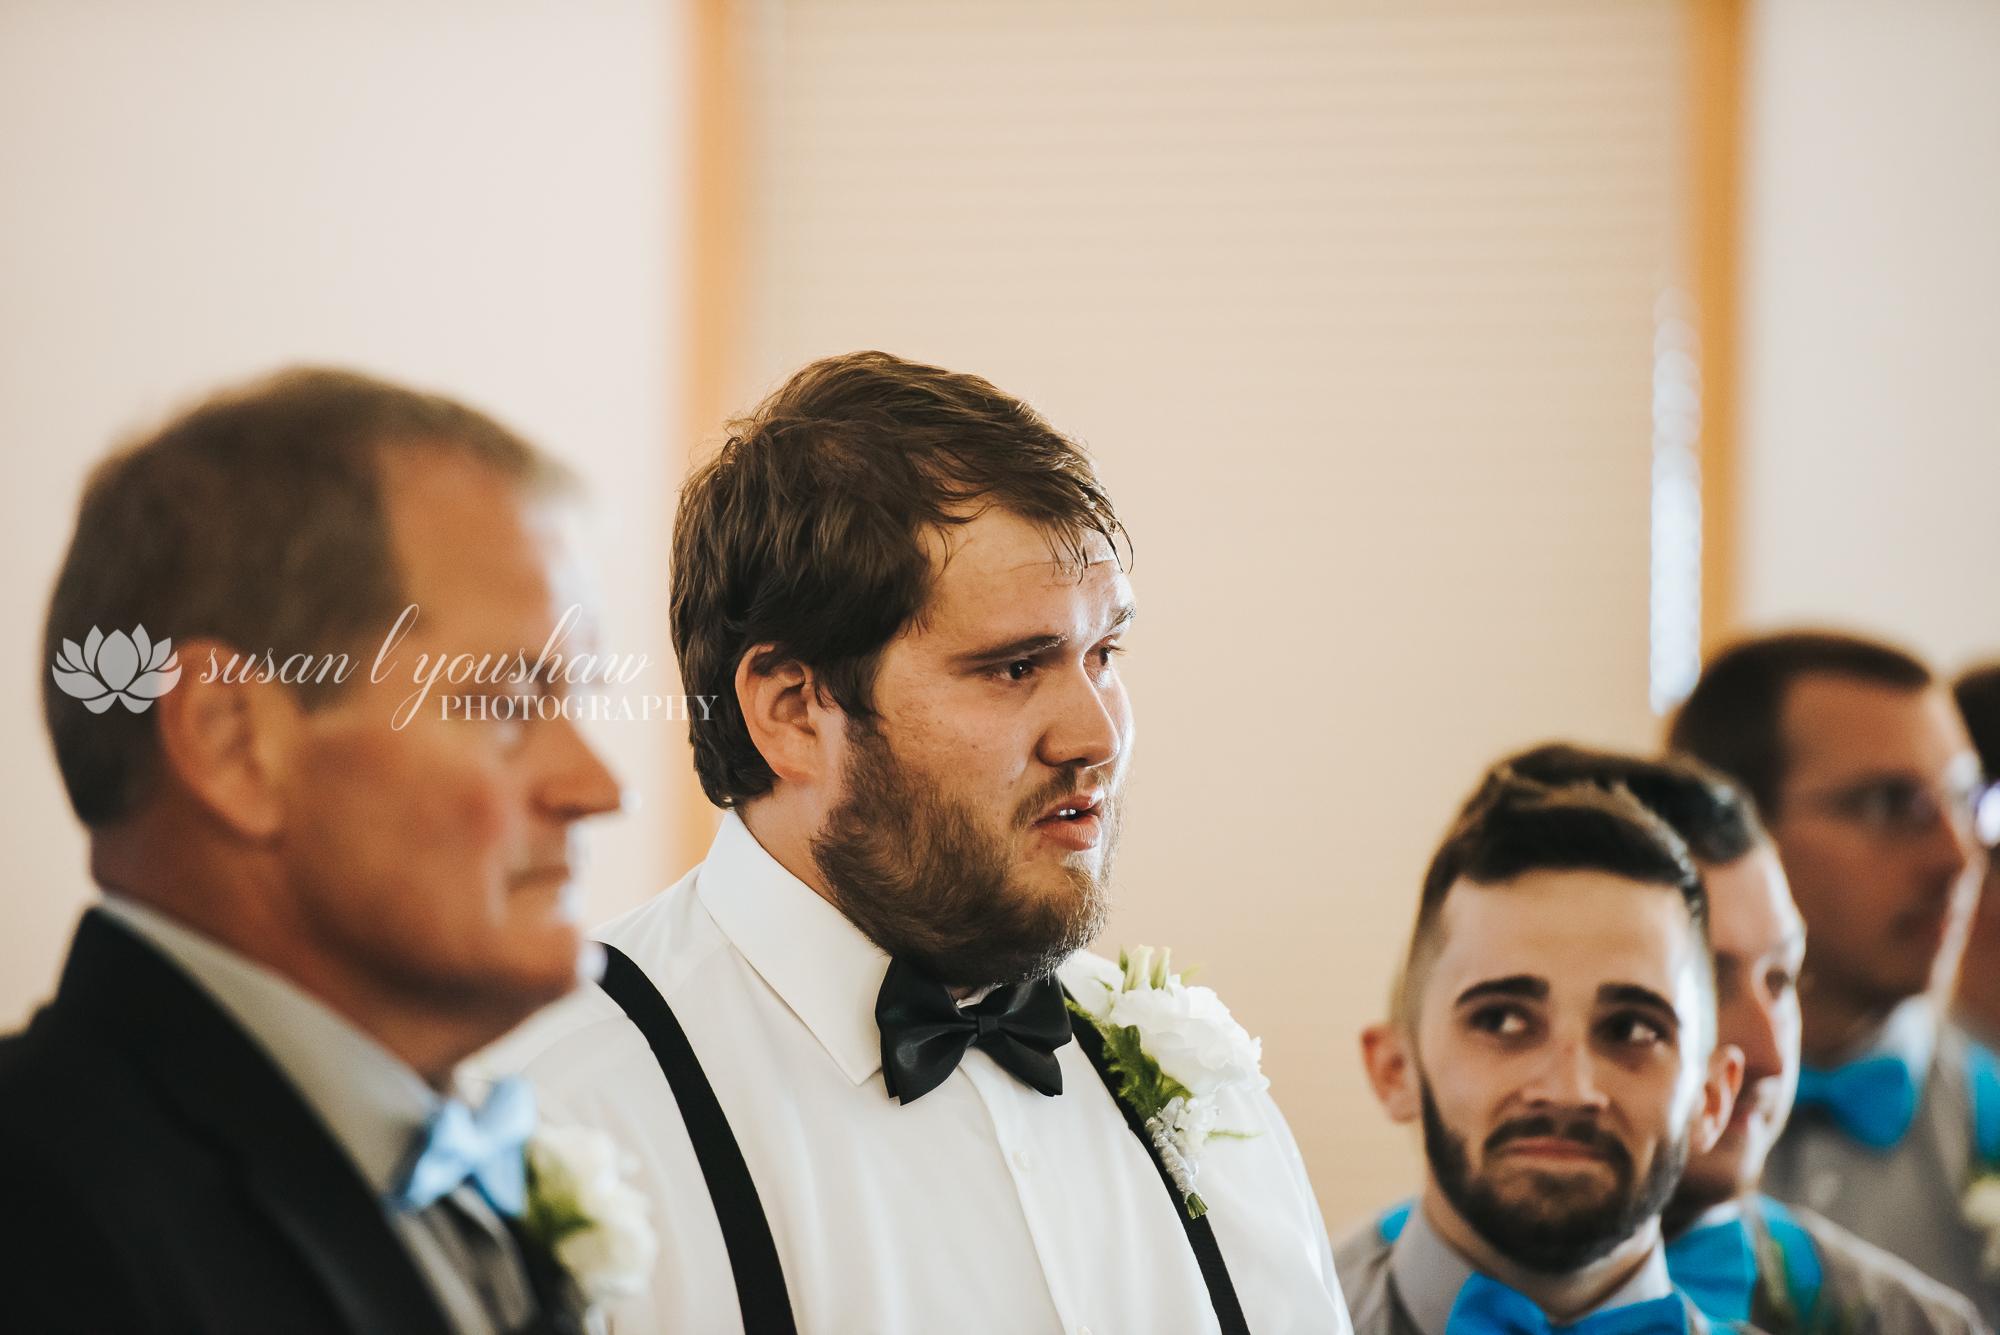 Katelyn and Wes Wedding Photos 07-13-2019 SLY Photography-52.jpg